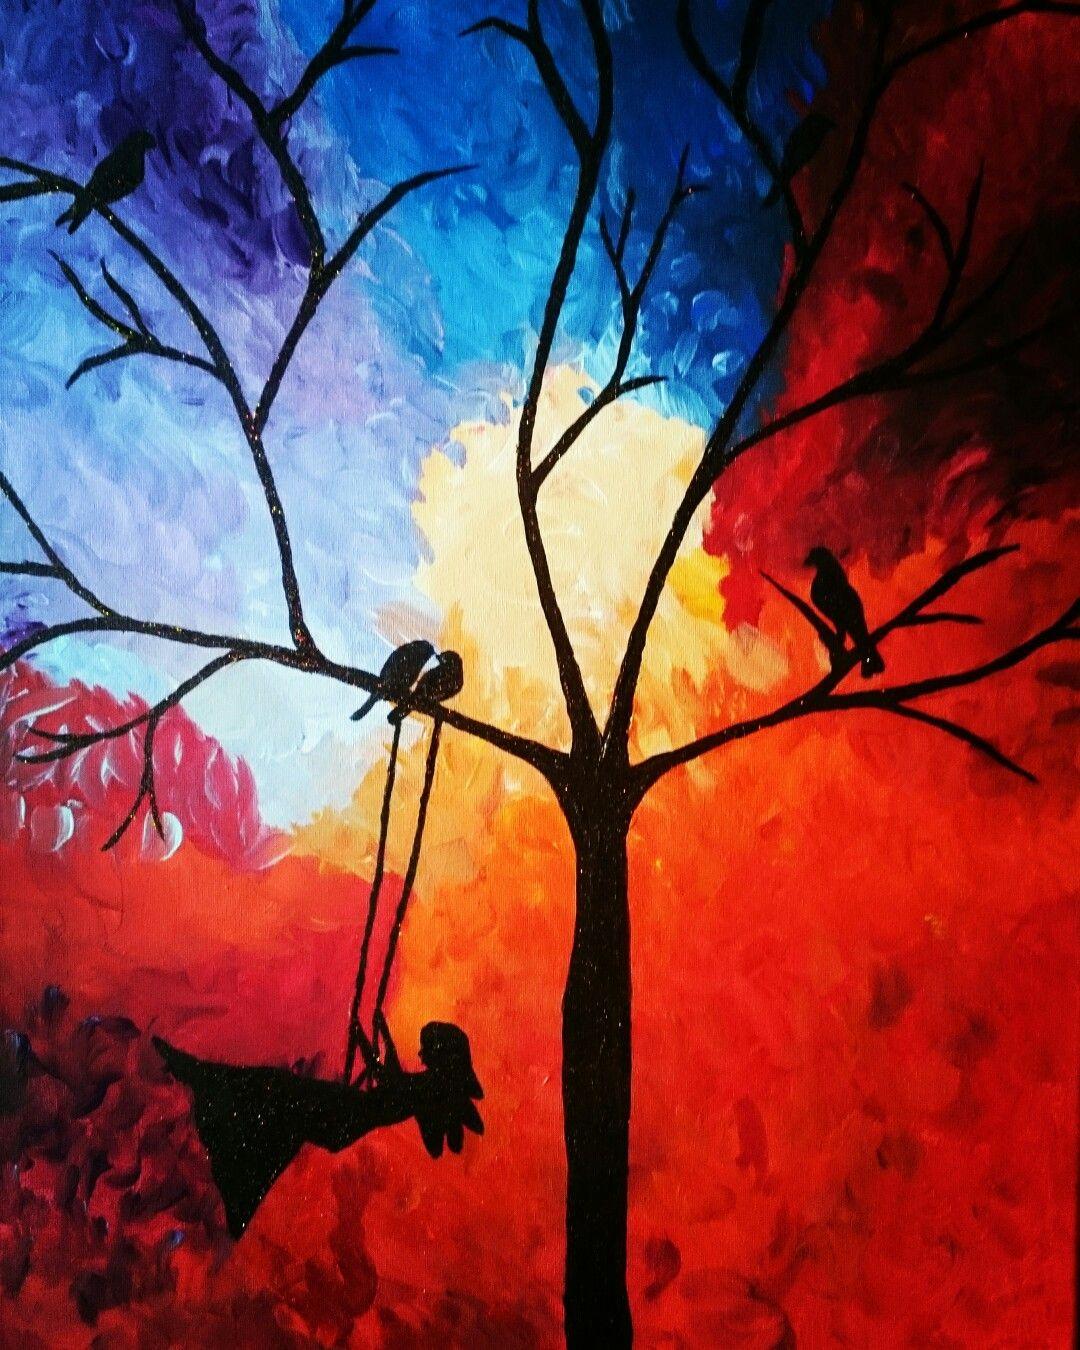 Herbst Autumn Zauber Magie Baum Tree Schaukel Leinwand